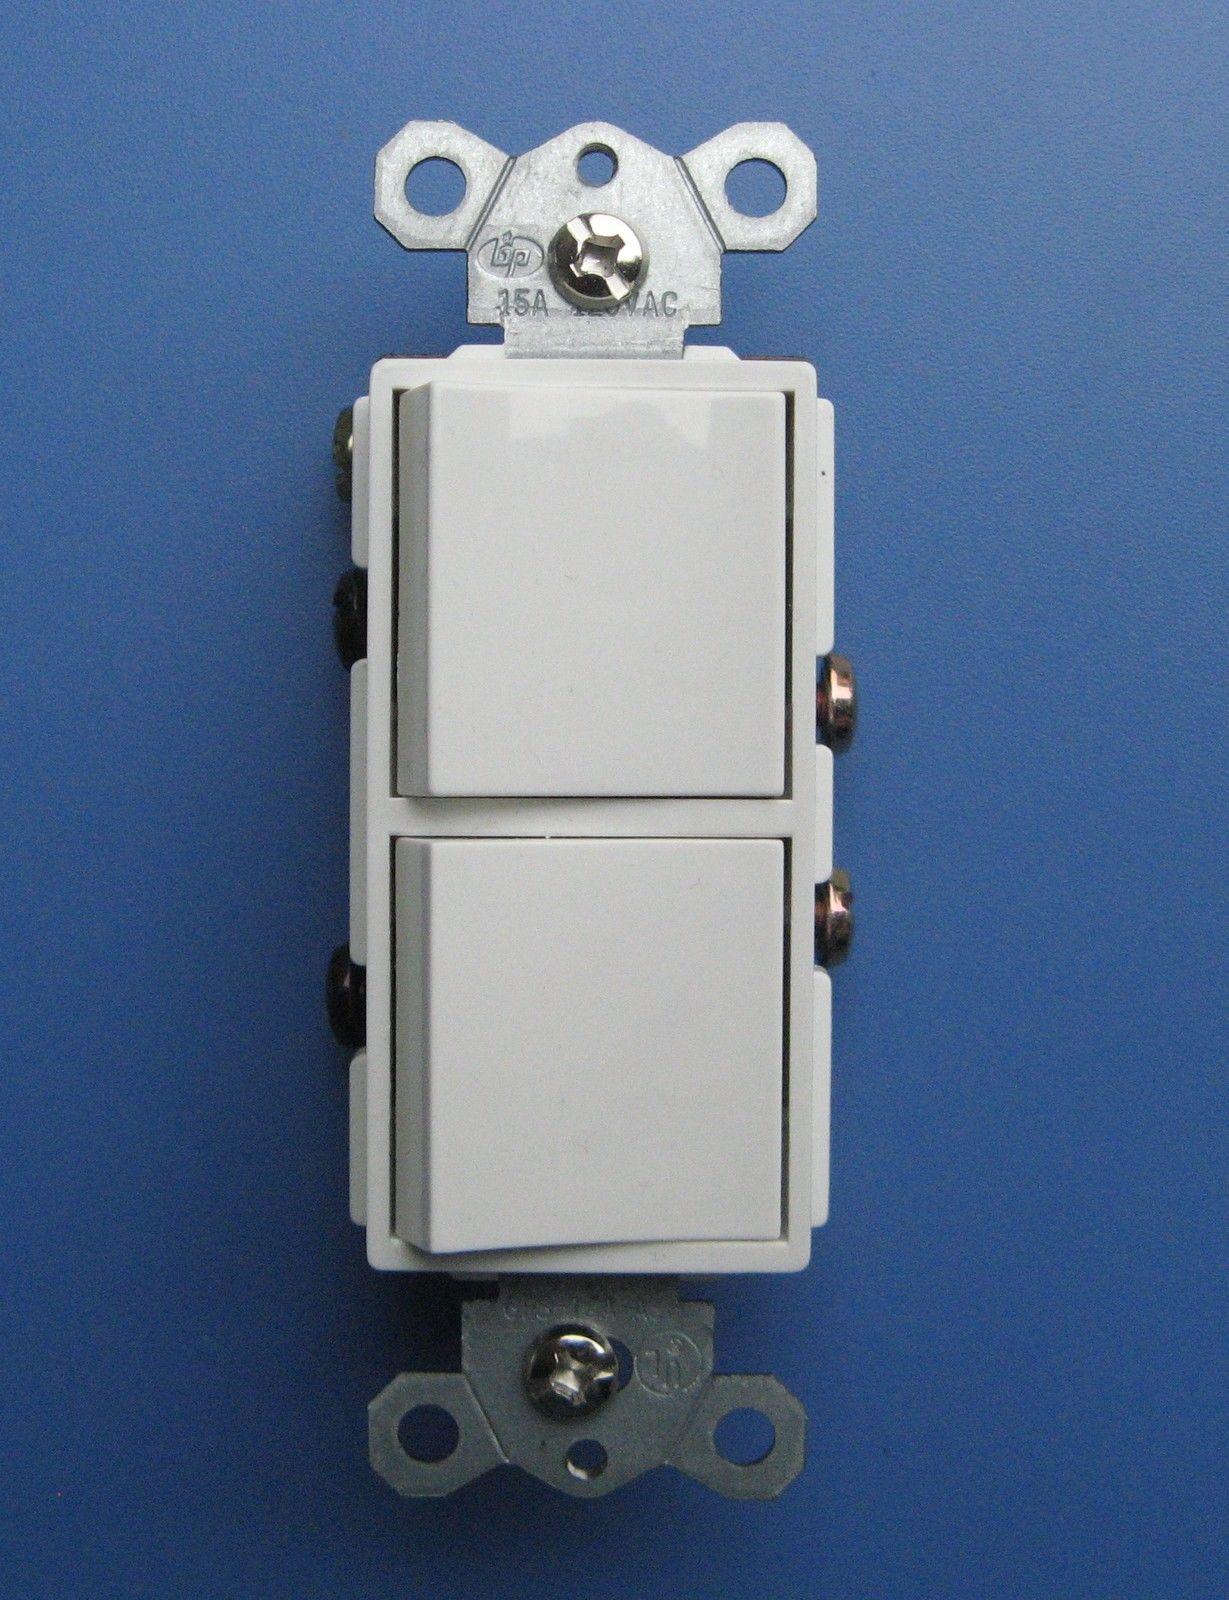 Decora Dual Rocker switch 120V 15Amp Single Pole UL with Wall Plate ...